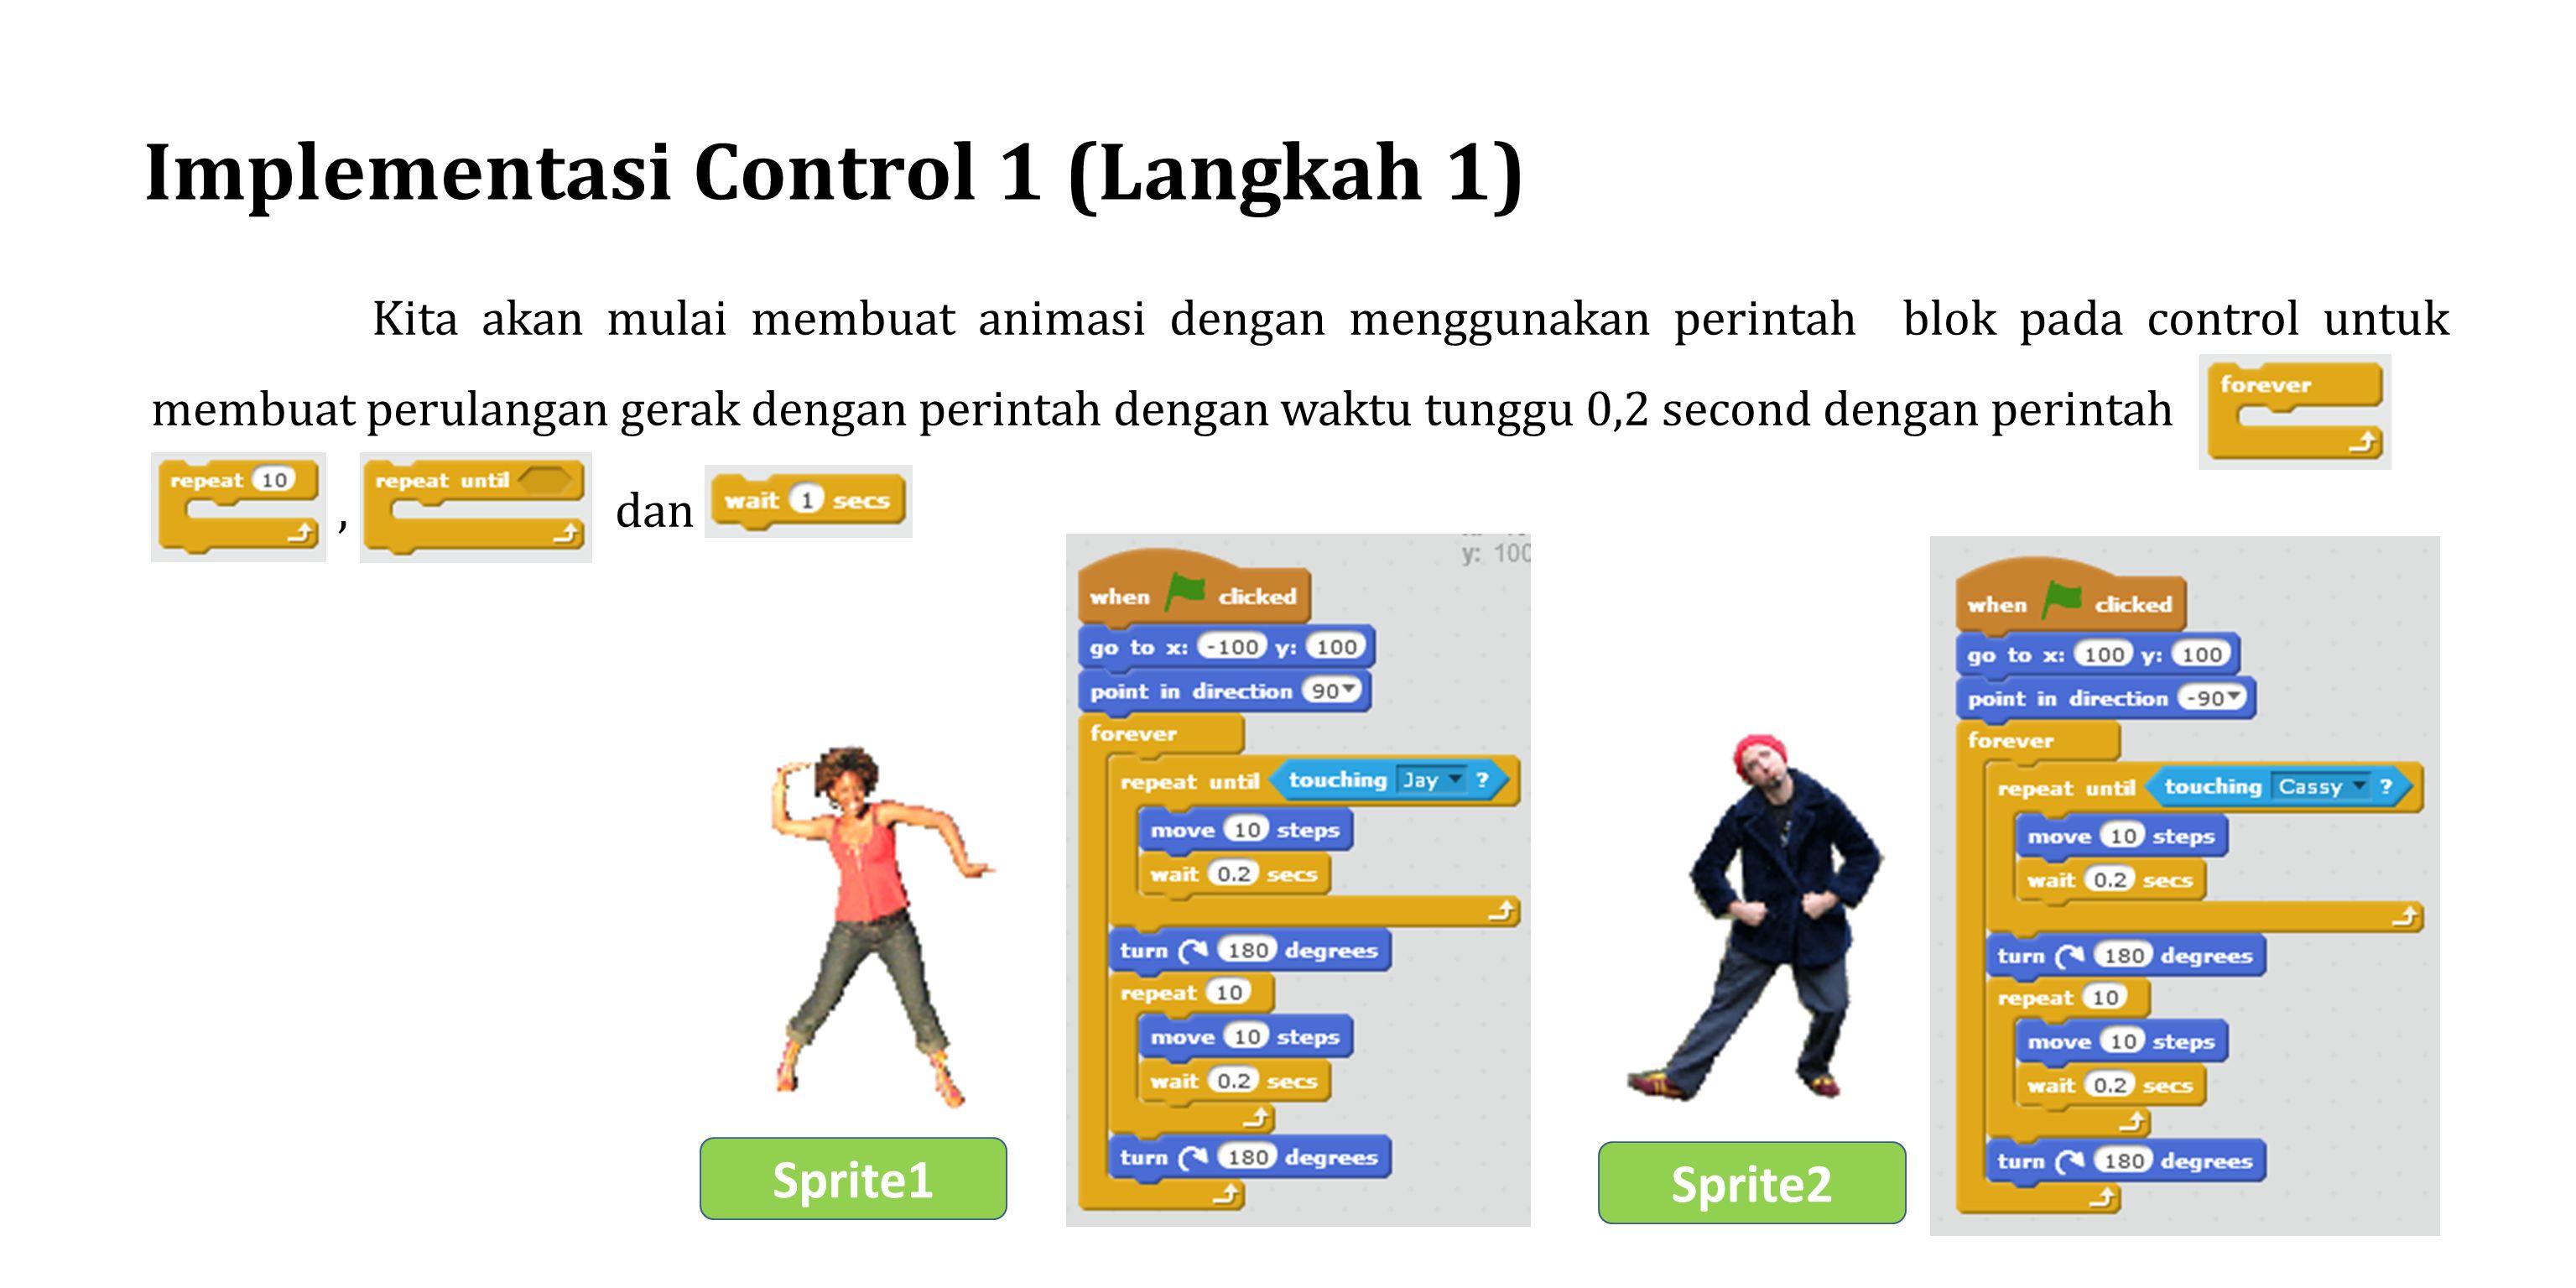 Implementasi Control 1 (Langkah 1)